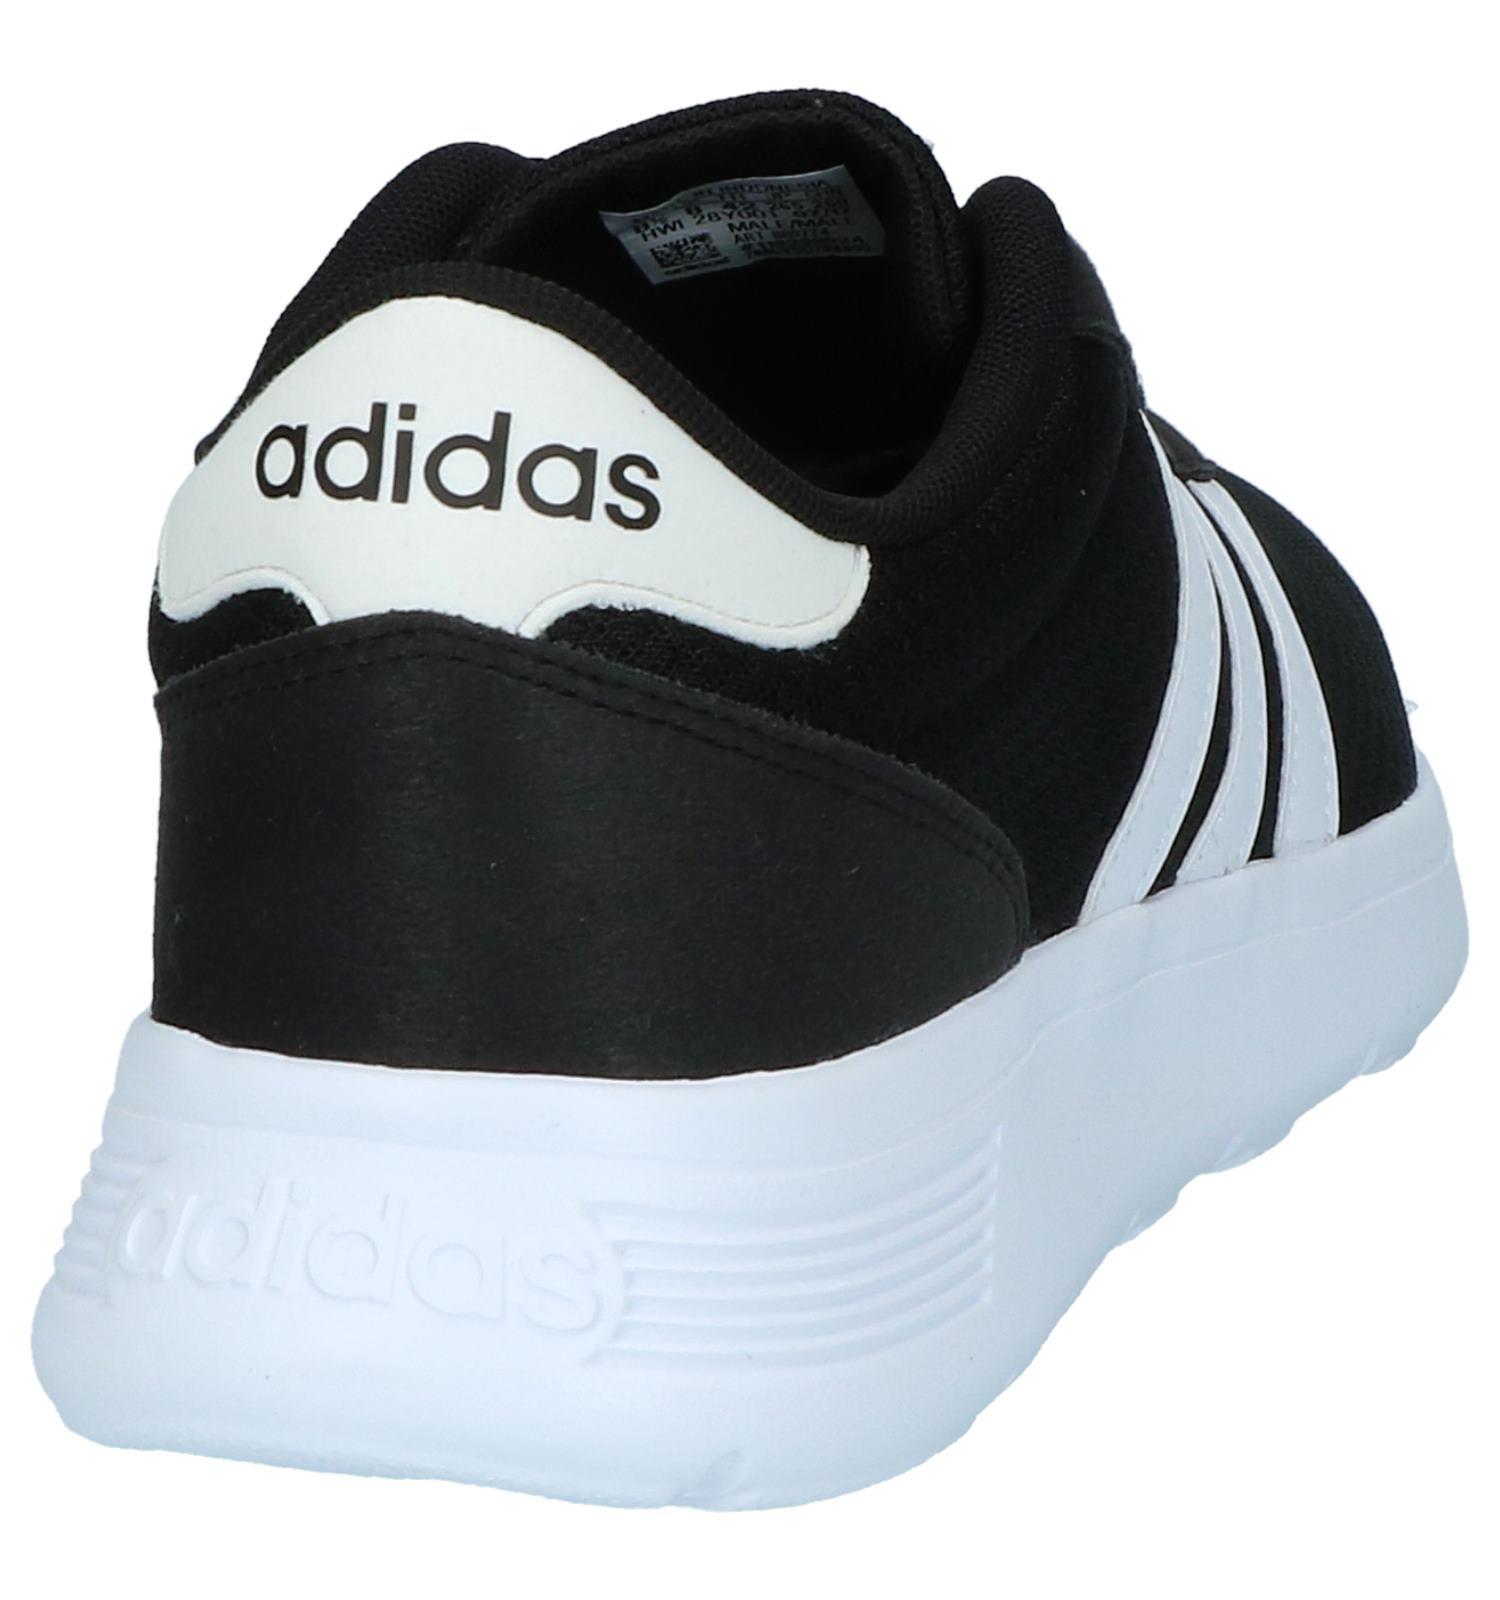 best sneakers 4d824 236a7 Lage Runner Sneakers Zwart adidas Lite Racer  TORFS.BE  Gratis verzend en  retour